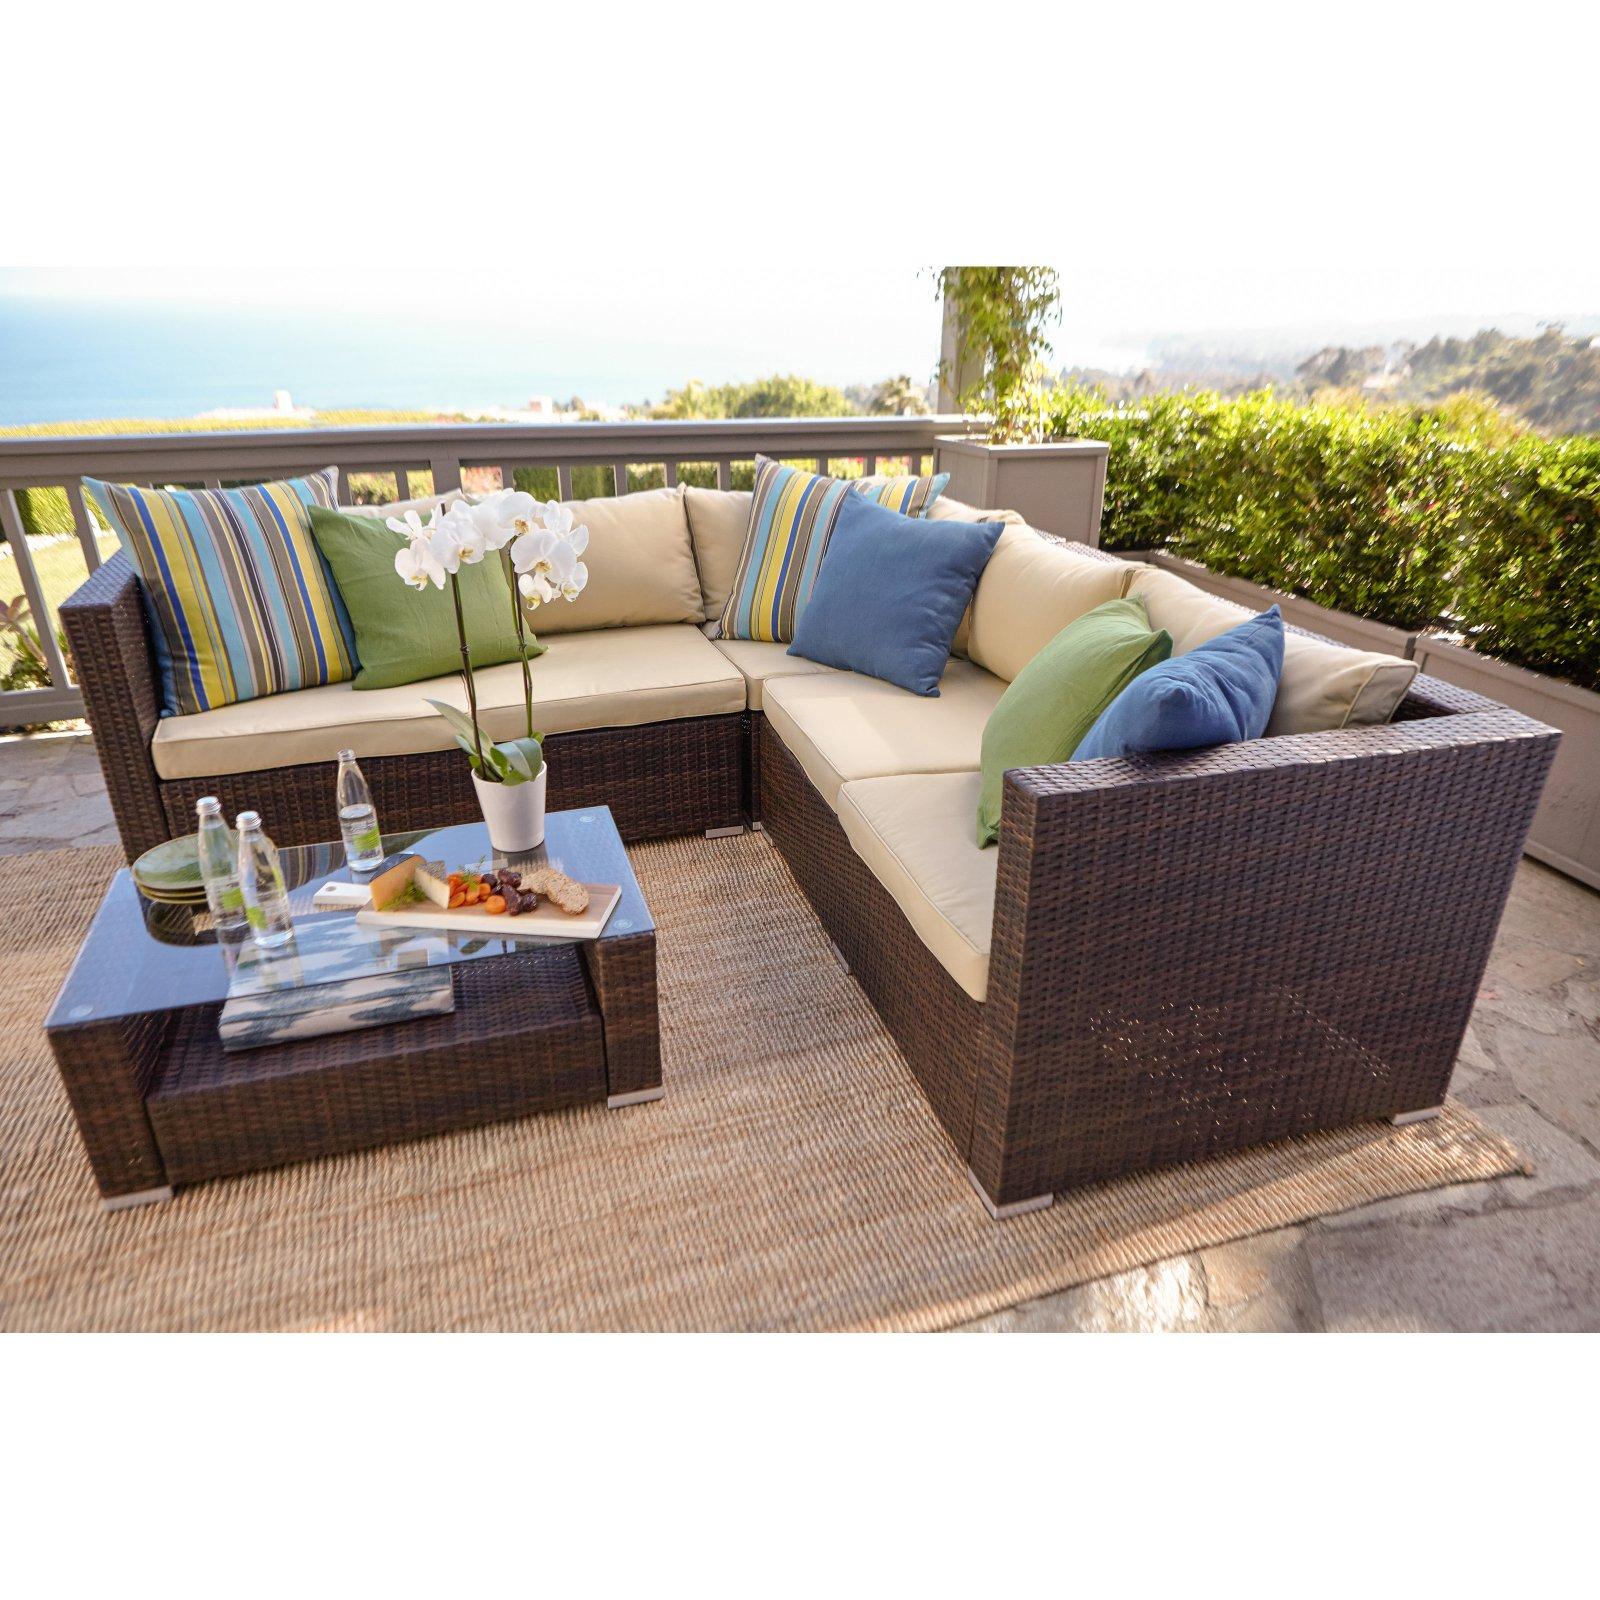 Incadozo Kessler 4 Piece Outdoor Wicker Sectional Sofa Set